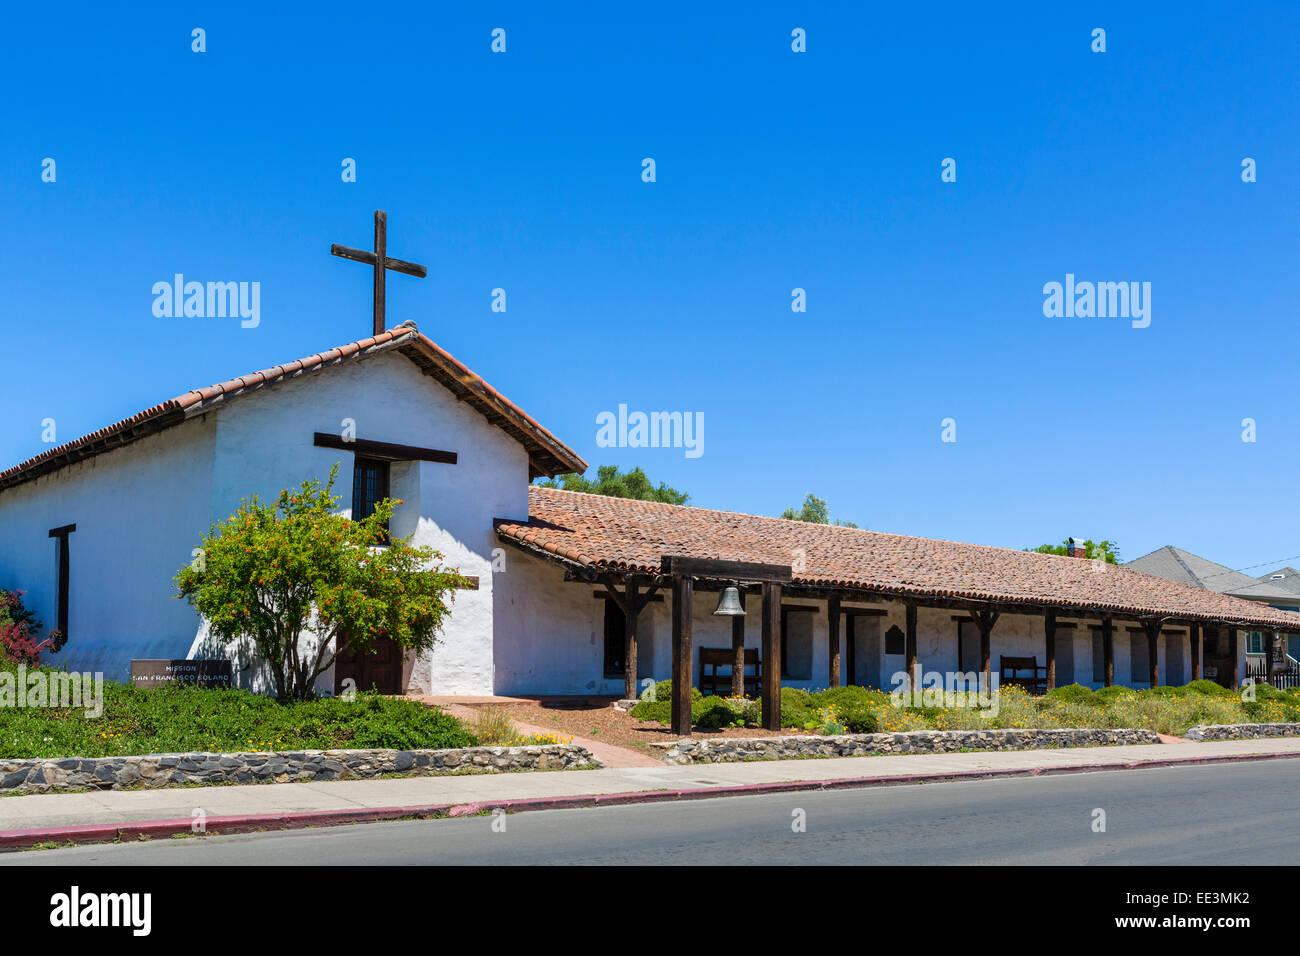 Mission San Francisco Solano, Sonoma State Historic Park, Sonoma, Wine Country, California, USA - Stock Image